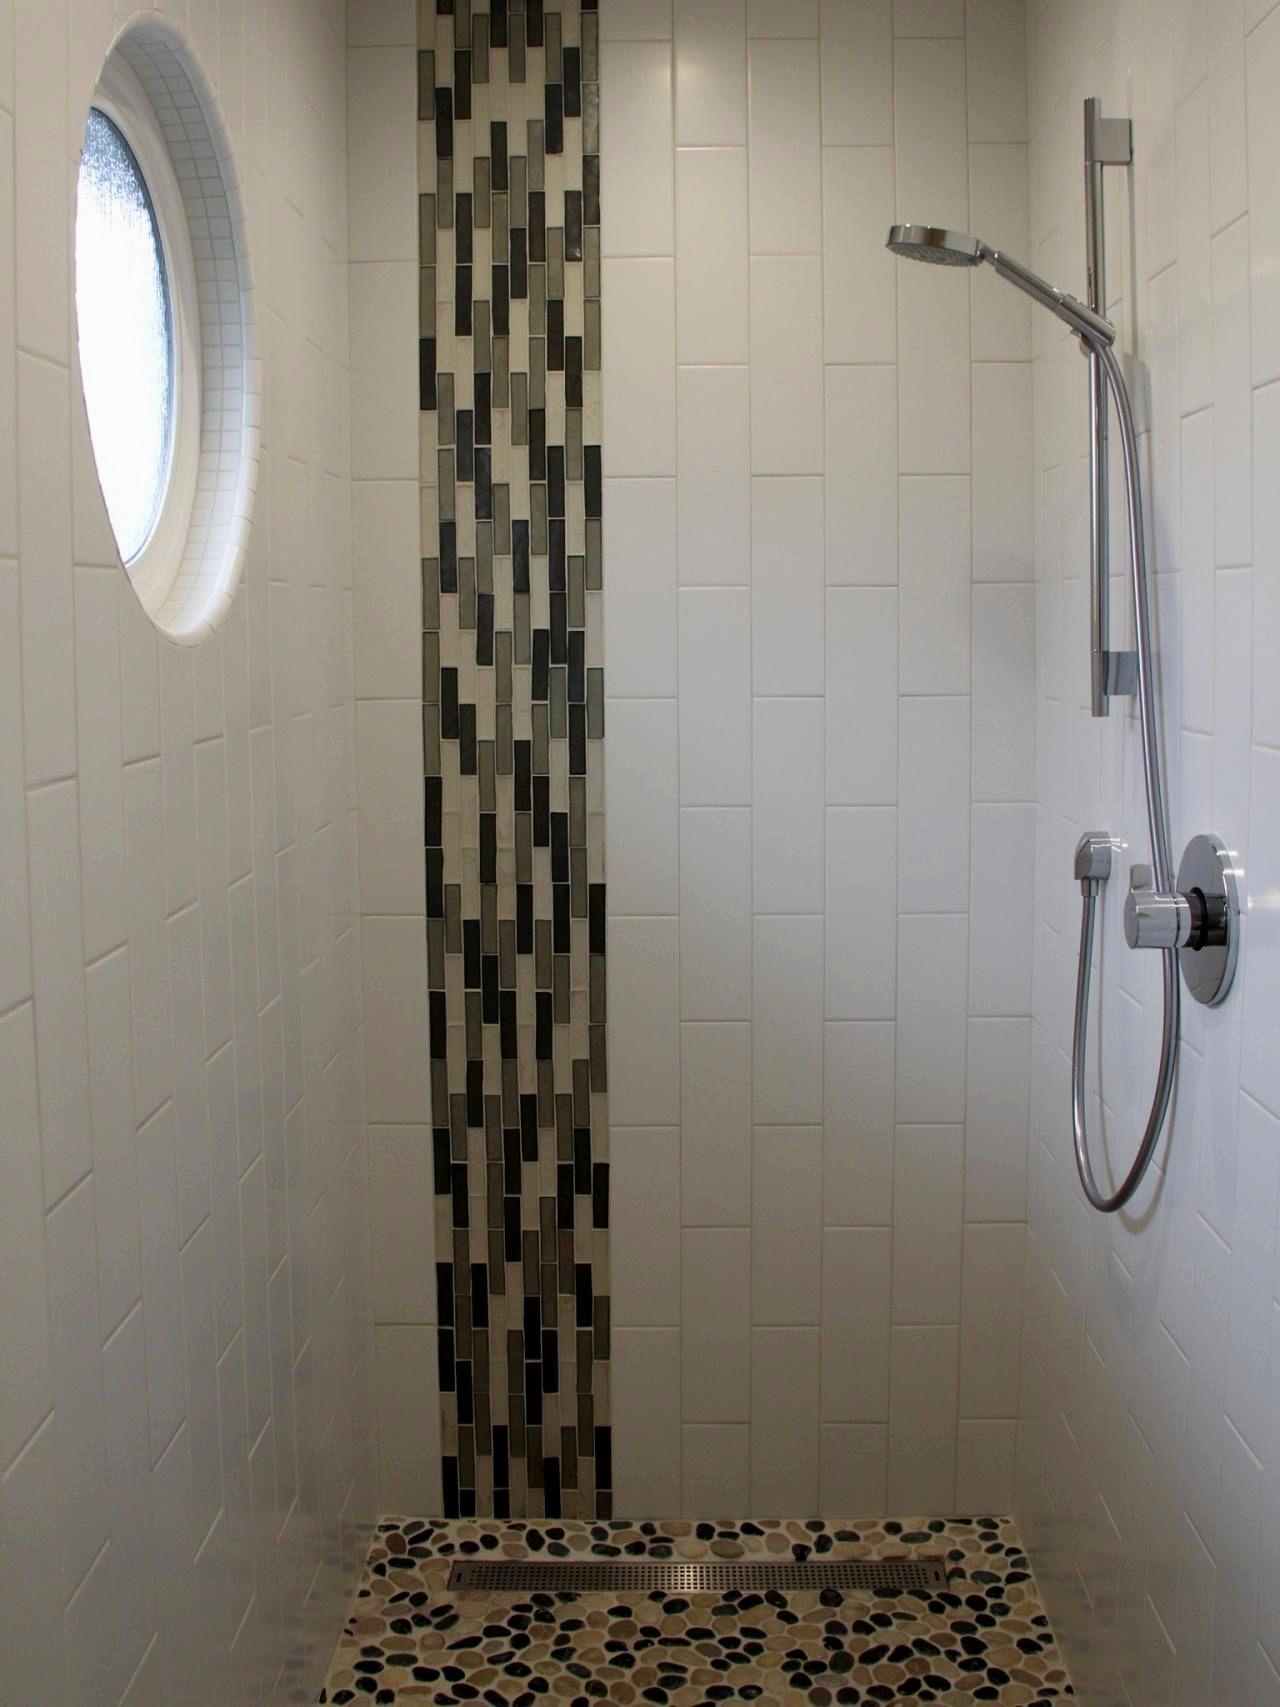 fresh tile backsplash bathroom construction-Lovely Tile Backsplash Bathroom Gallery